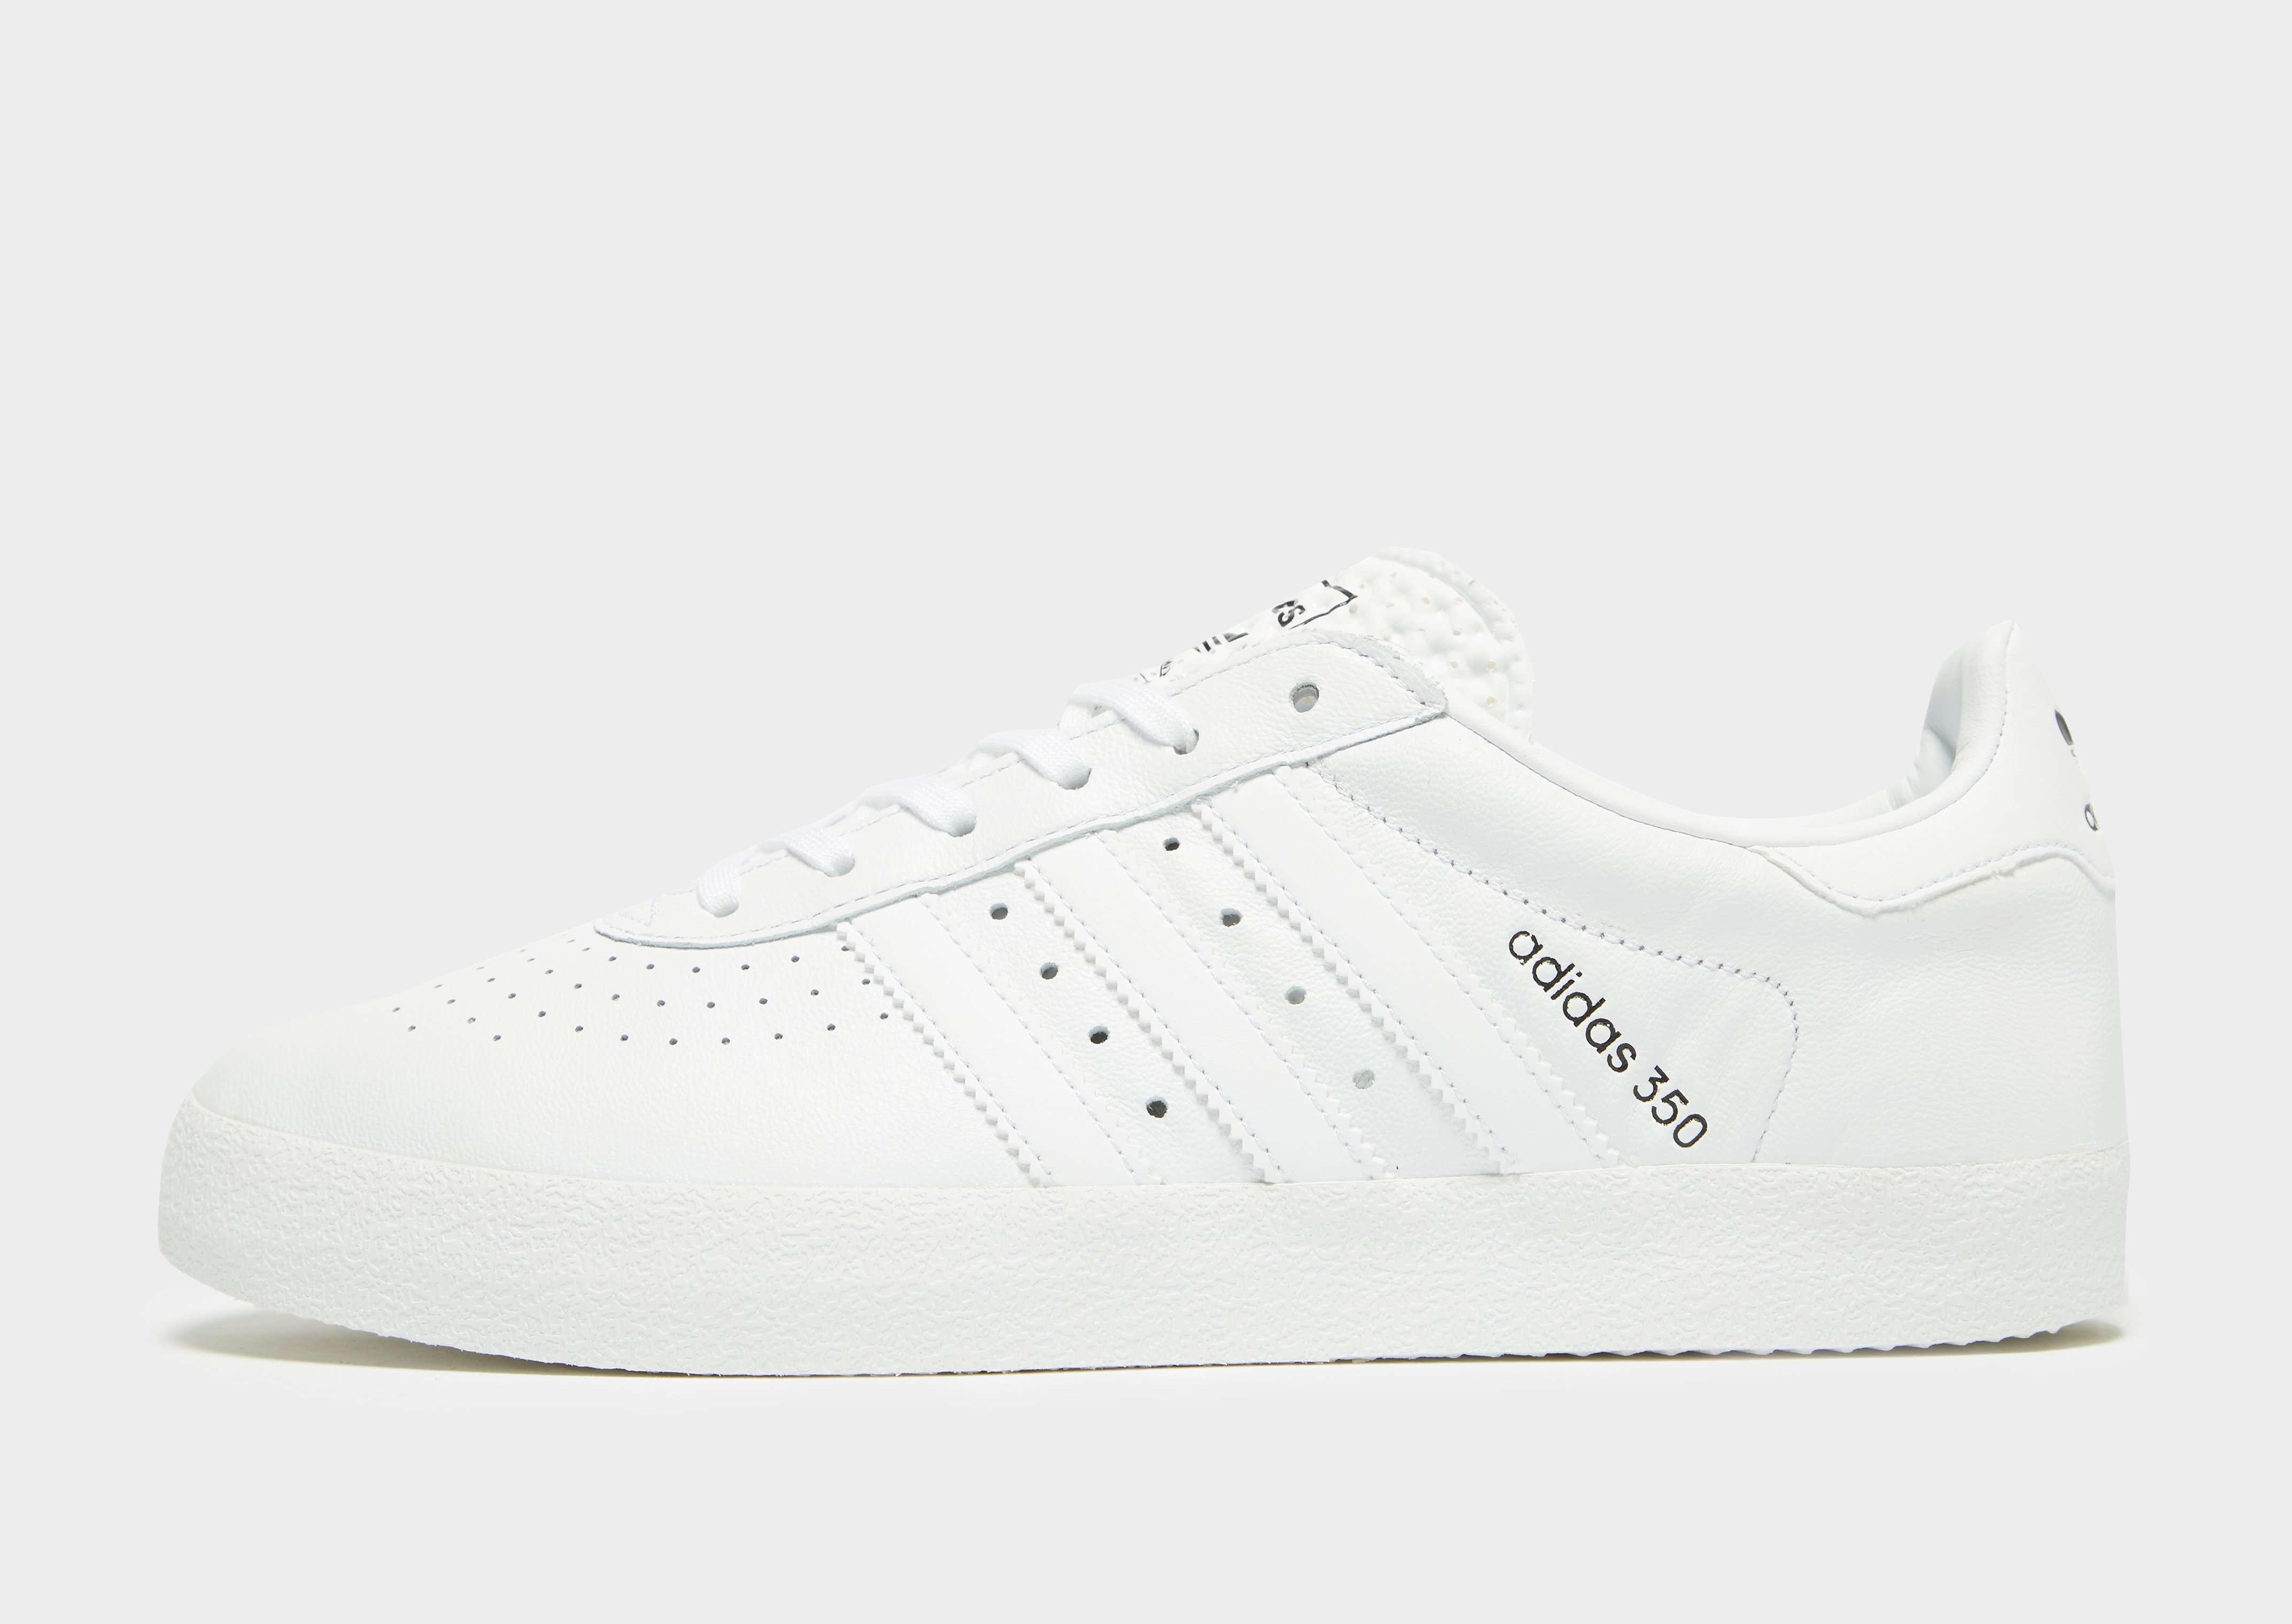 promo code 431ad 7814f adidas Originals 350 Leather   JD Sports